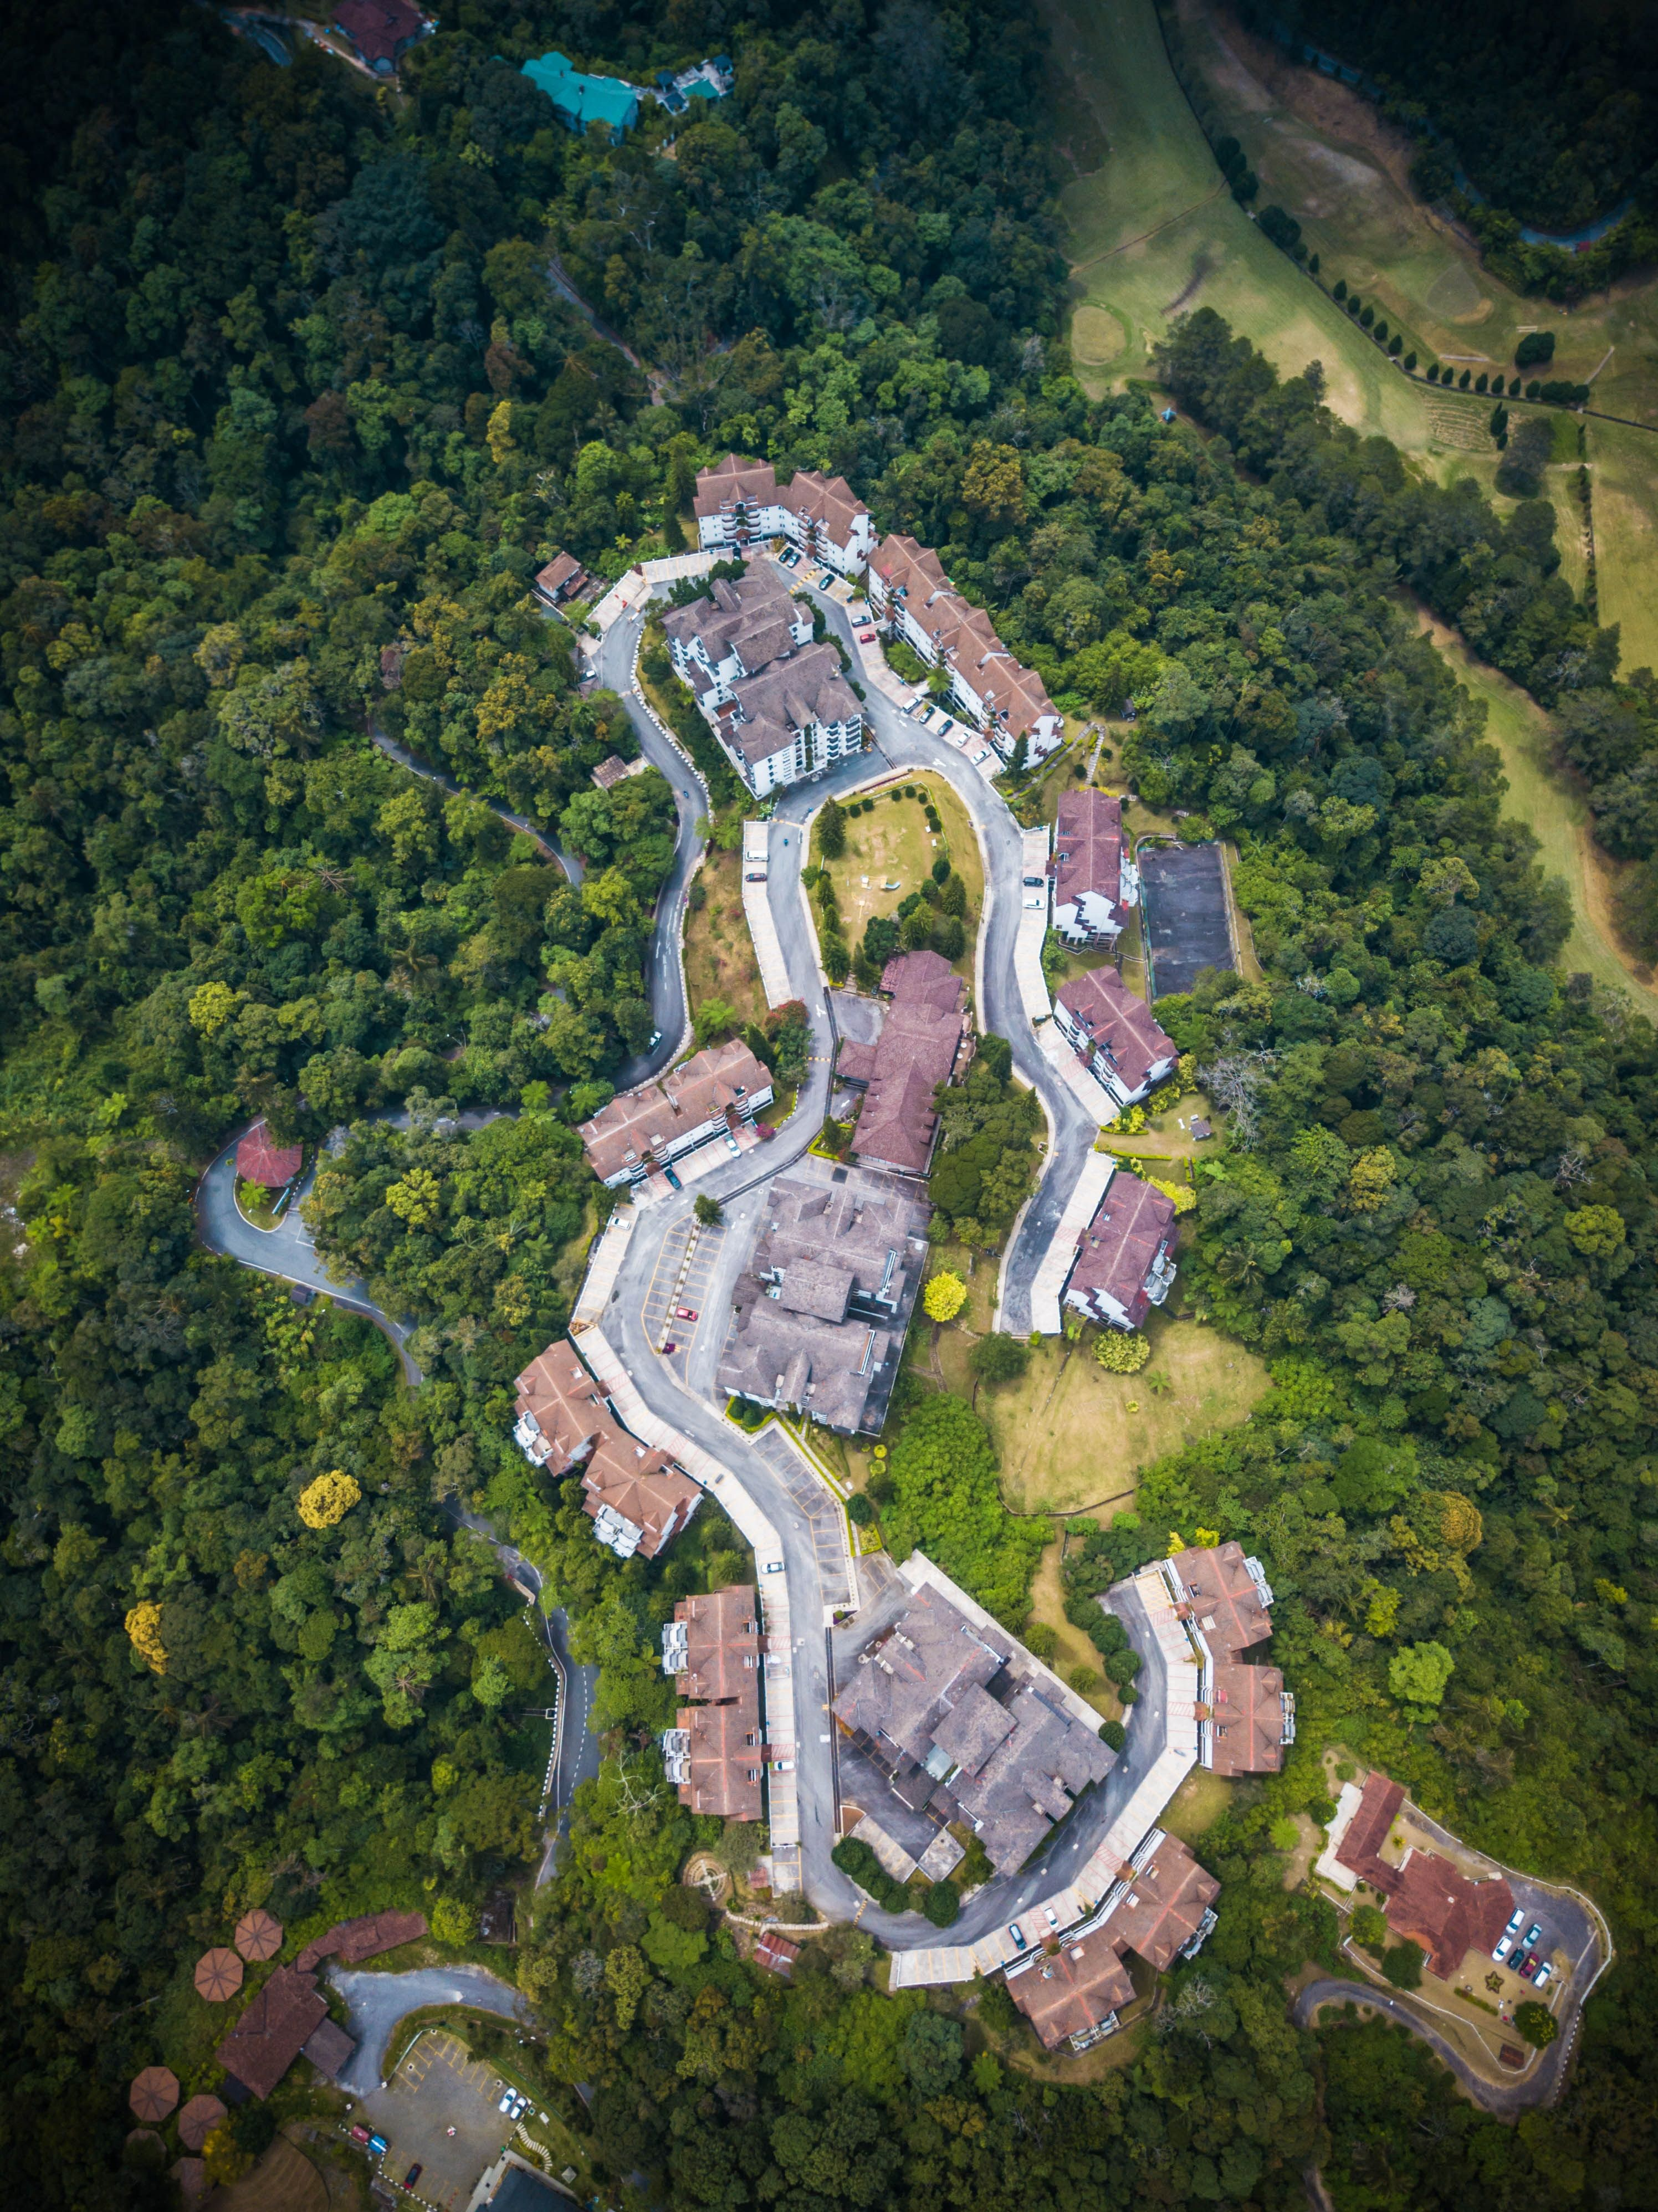 Fraser's Hill, Malaysia, birds eye view of village, DJI